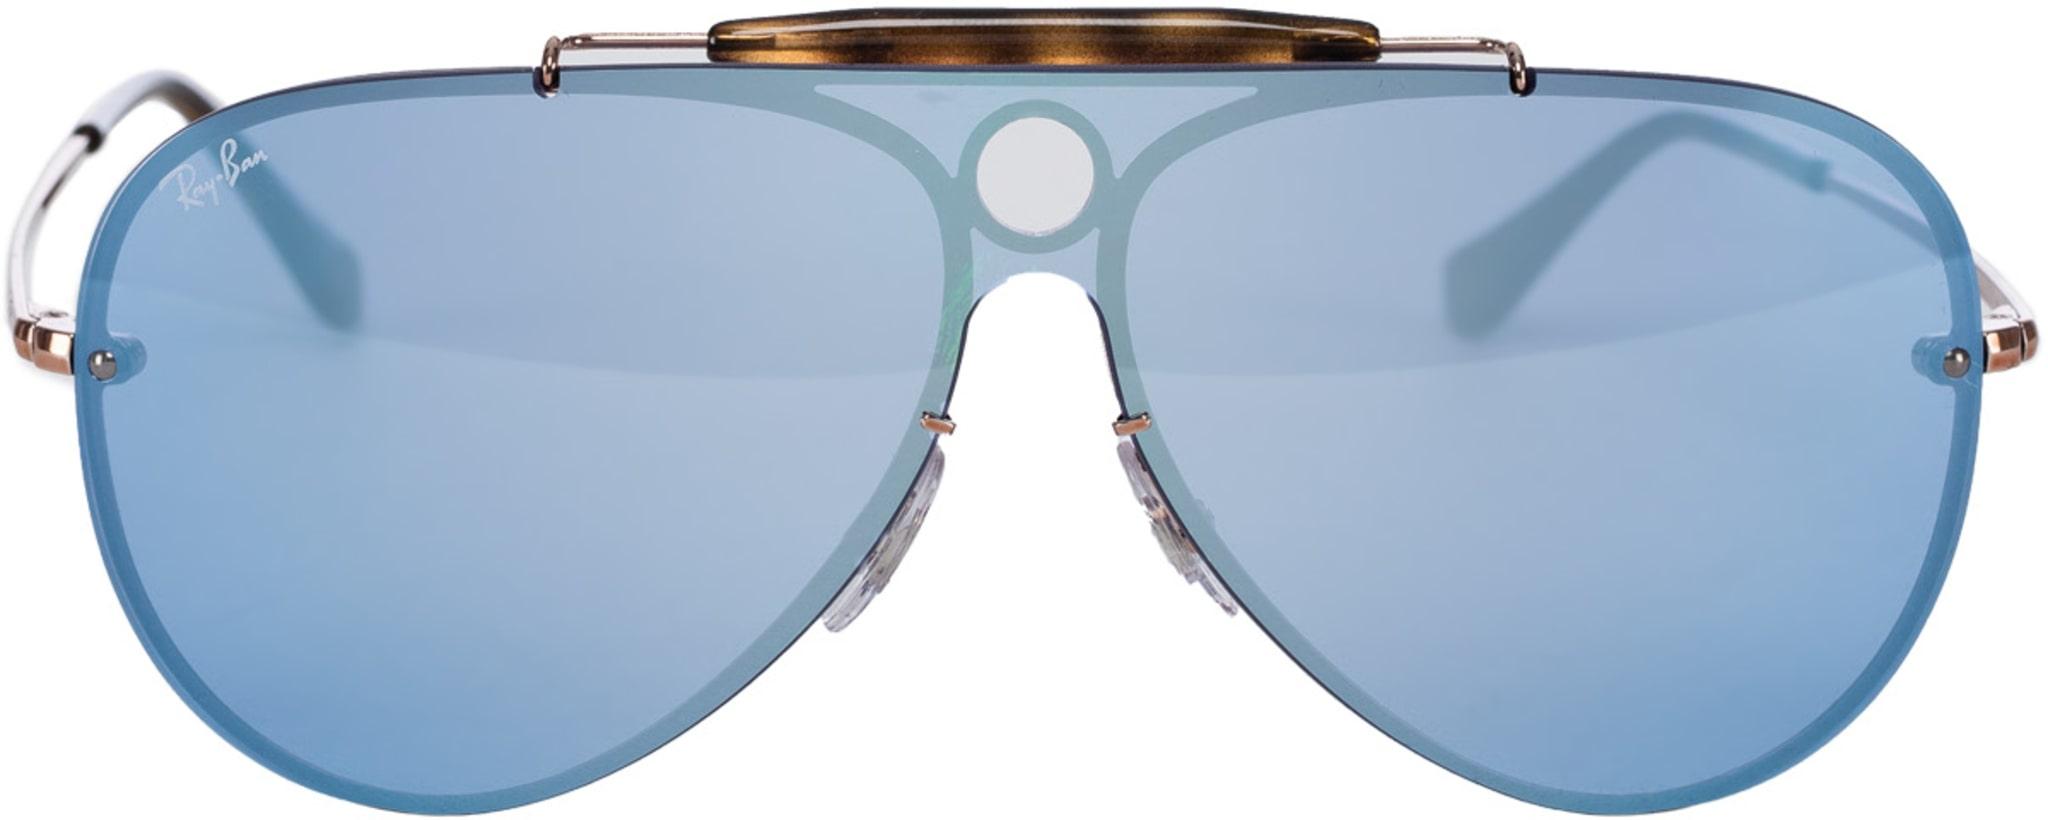 5157213fee Ray-Ban  Blaze Shooter Sunglasses - Bronze Copper Violet Mirror ...